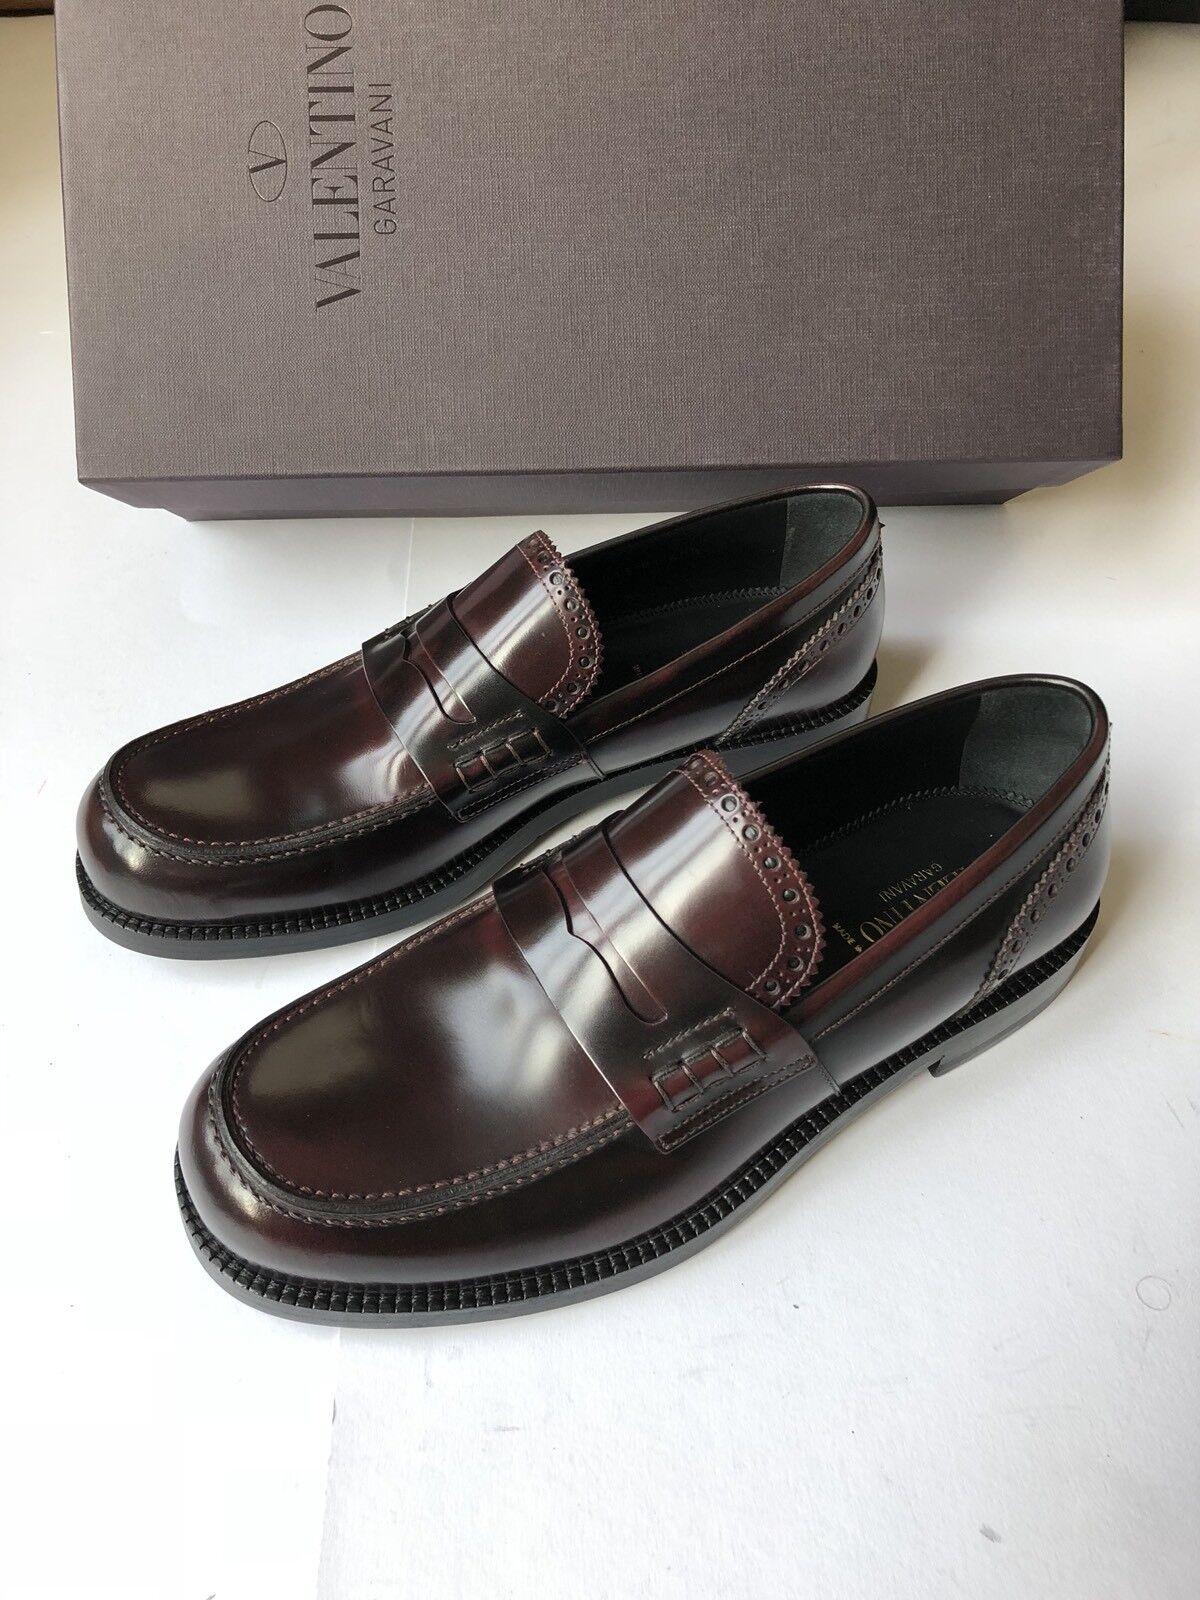 Valentino Garavani Pelle loafer/Scarpe RUBINO UE 40 US 7 NUOVO OVP l.p.699 EUR